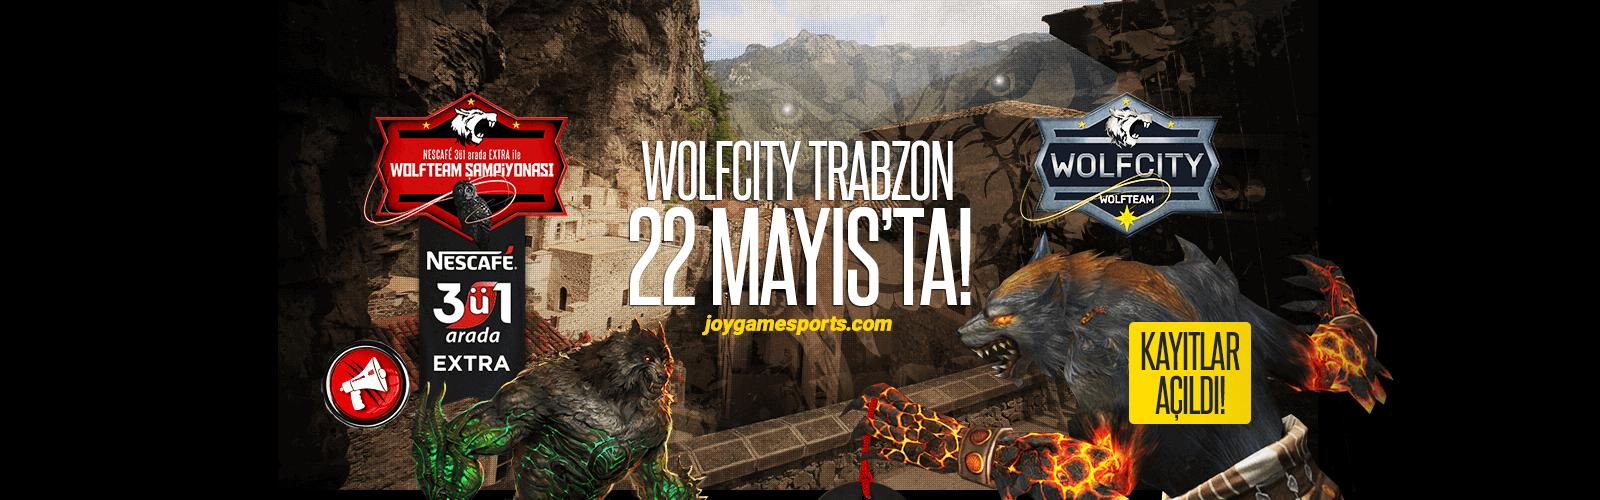 WOLFCITY Trabzon